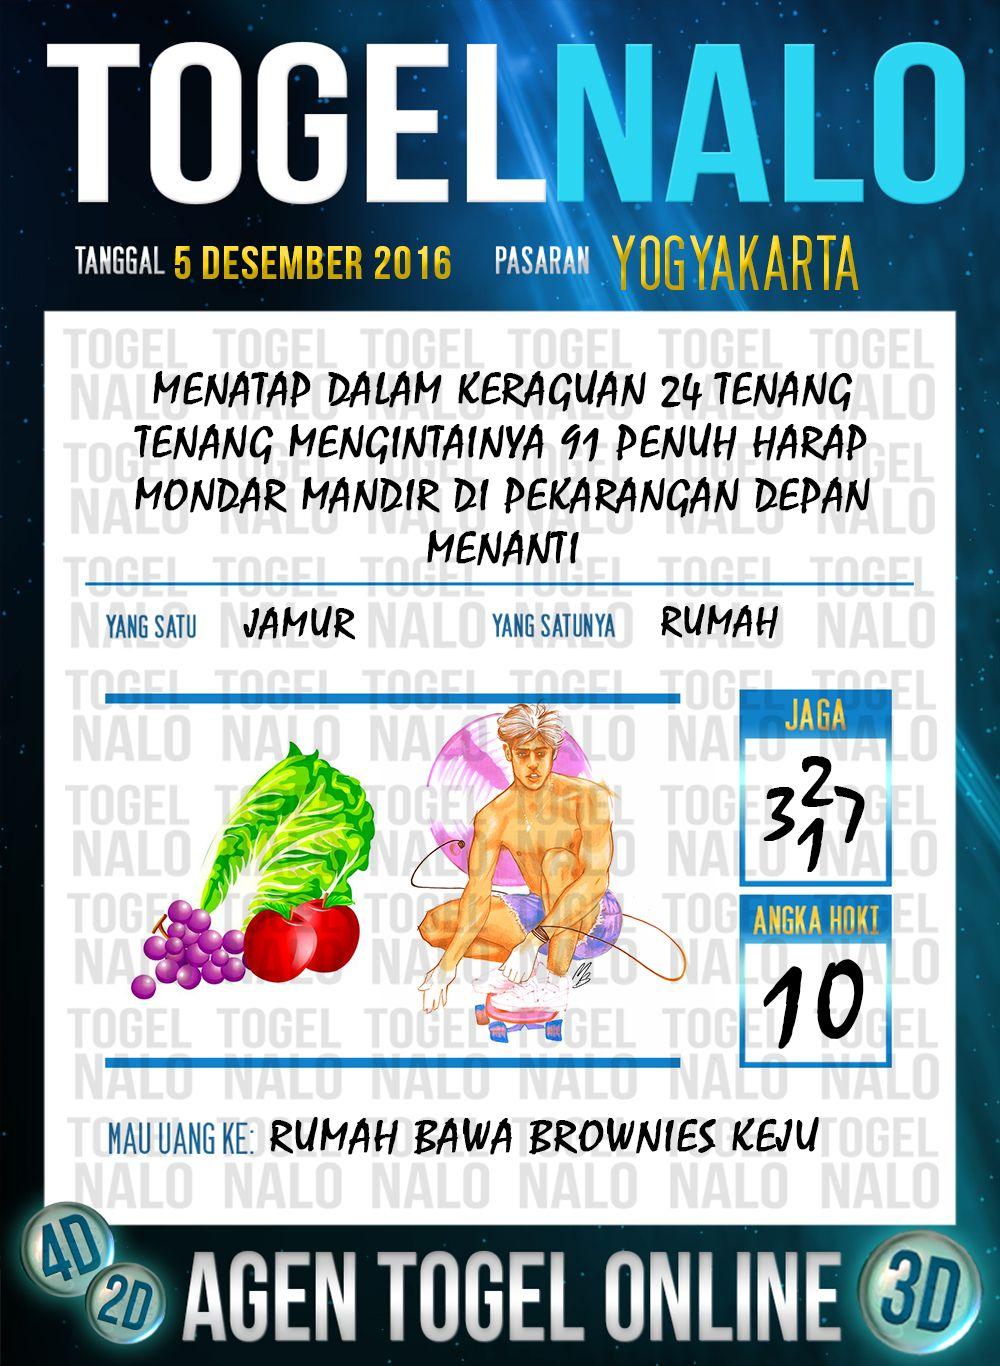 Angka Kodal D Togel Wap Online Live Draw D Togelnalo Yogyakarta